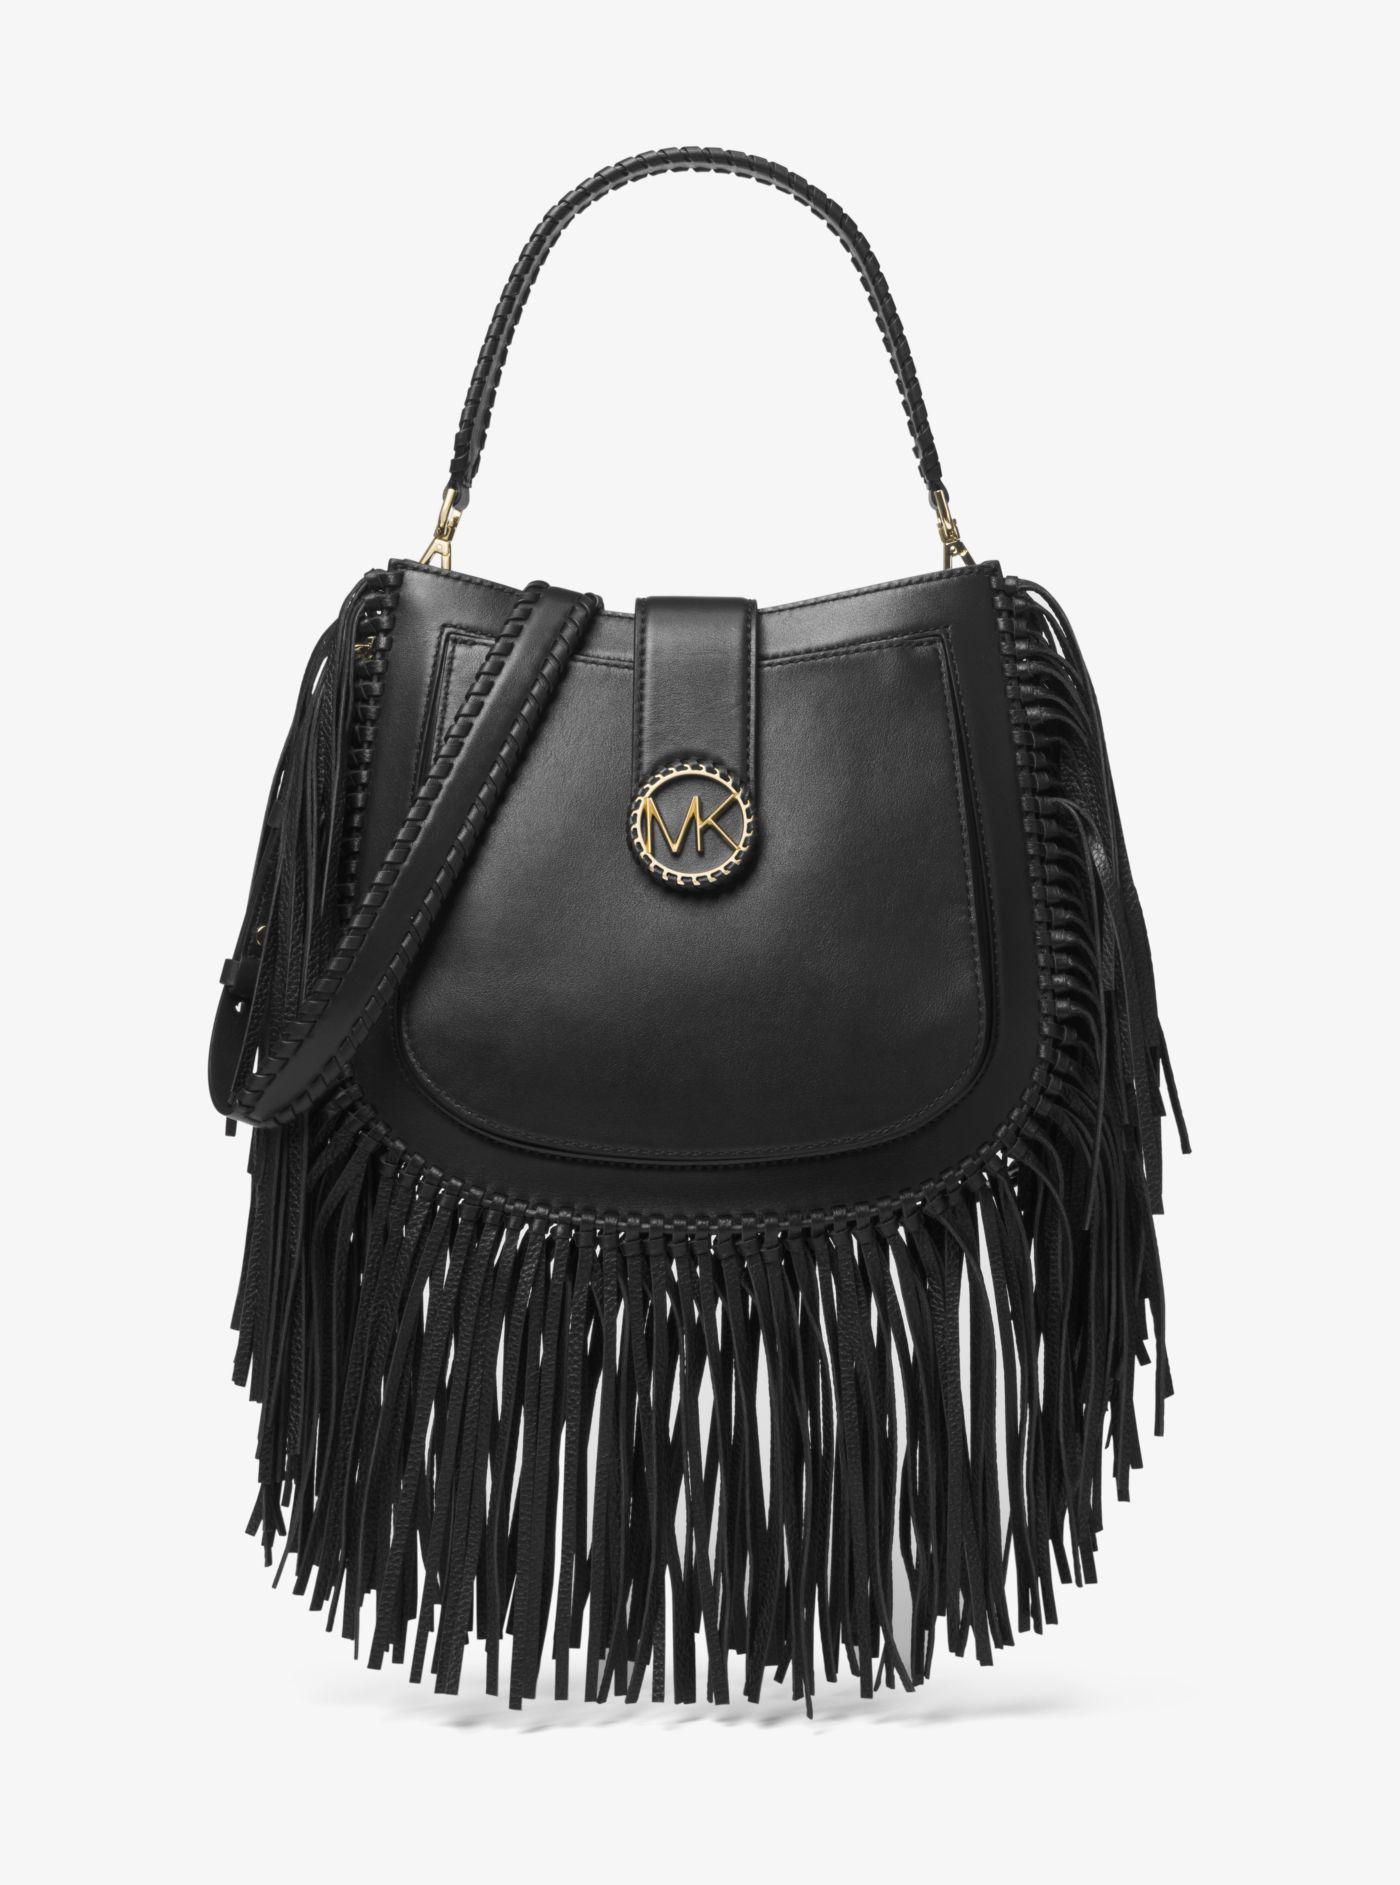 3c69e383d5dcc2 ... czech lyst michael kors lillie medium fringed leather shoulder bag in  black 70356 e8254